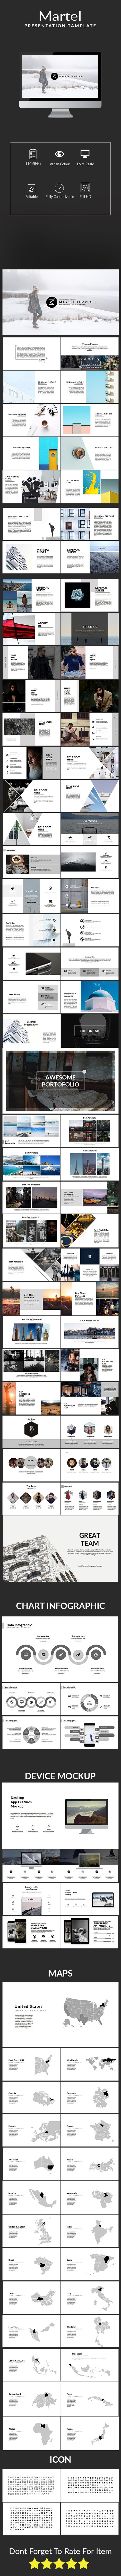 Martel Multipurpose Template - PowerPoint Templates Presentation Templates